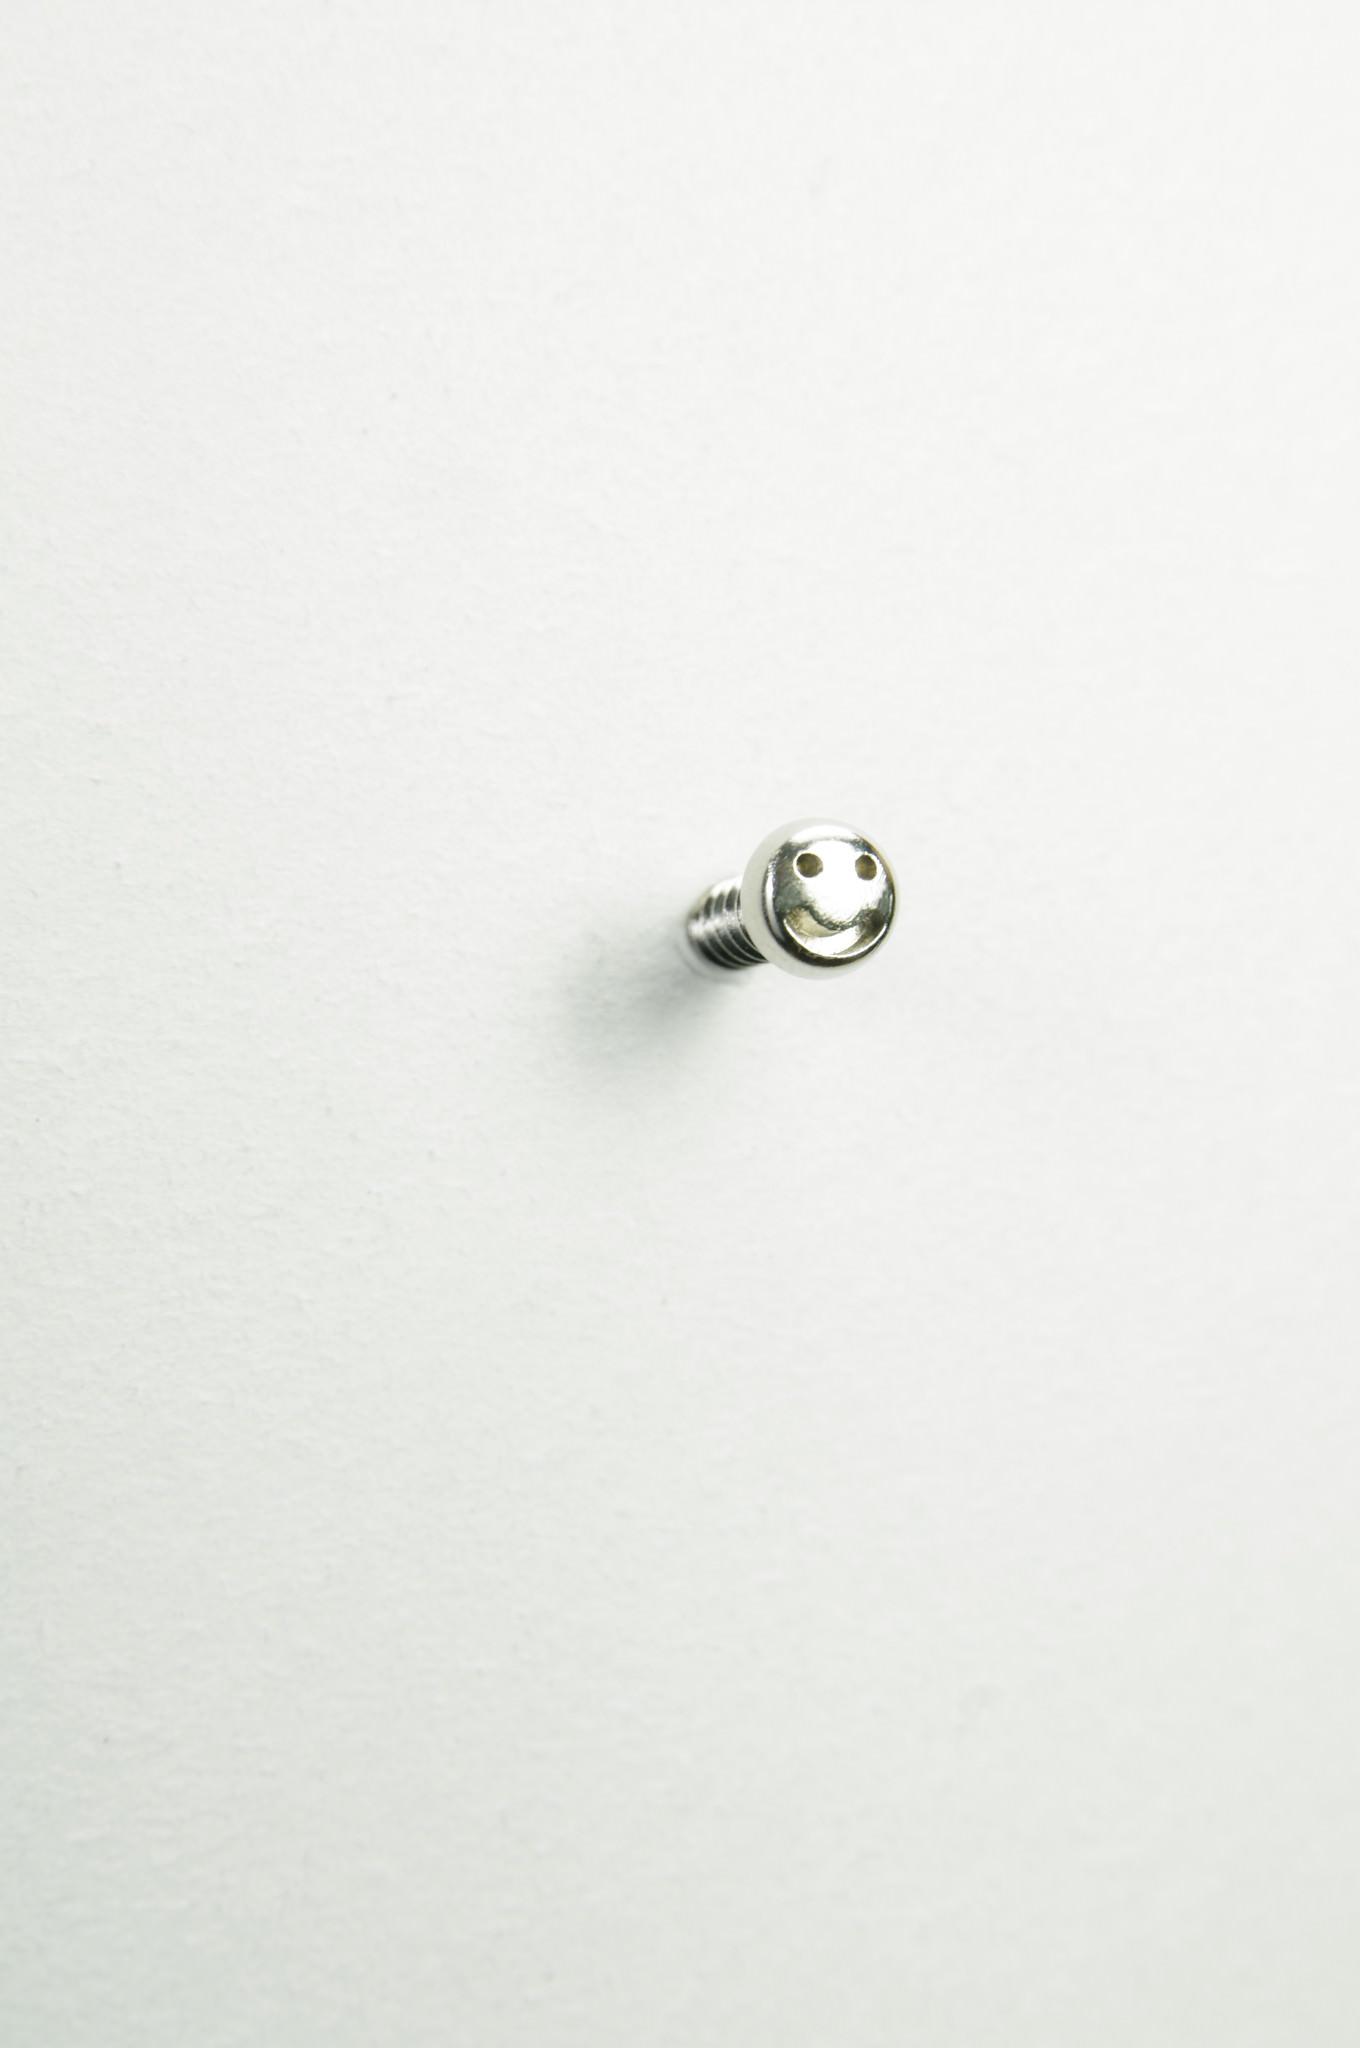 screw_13